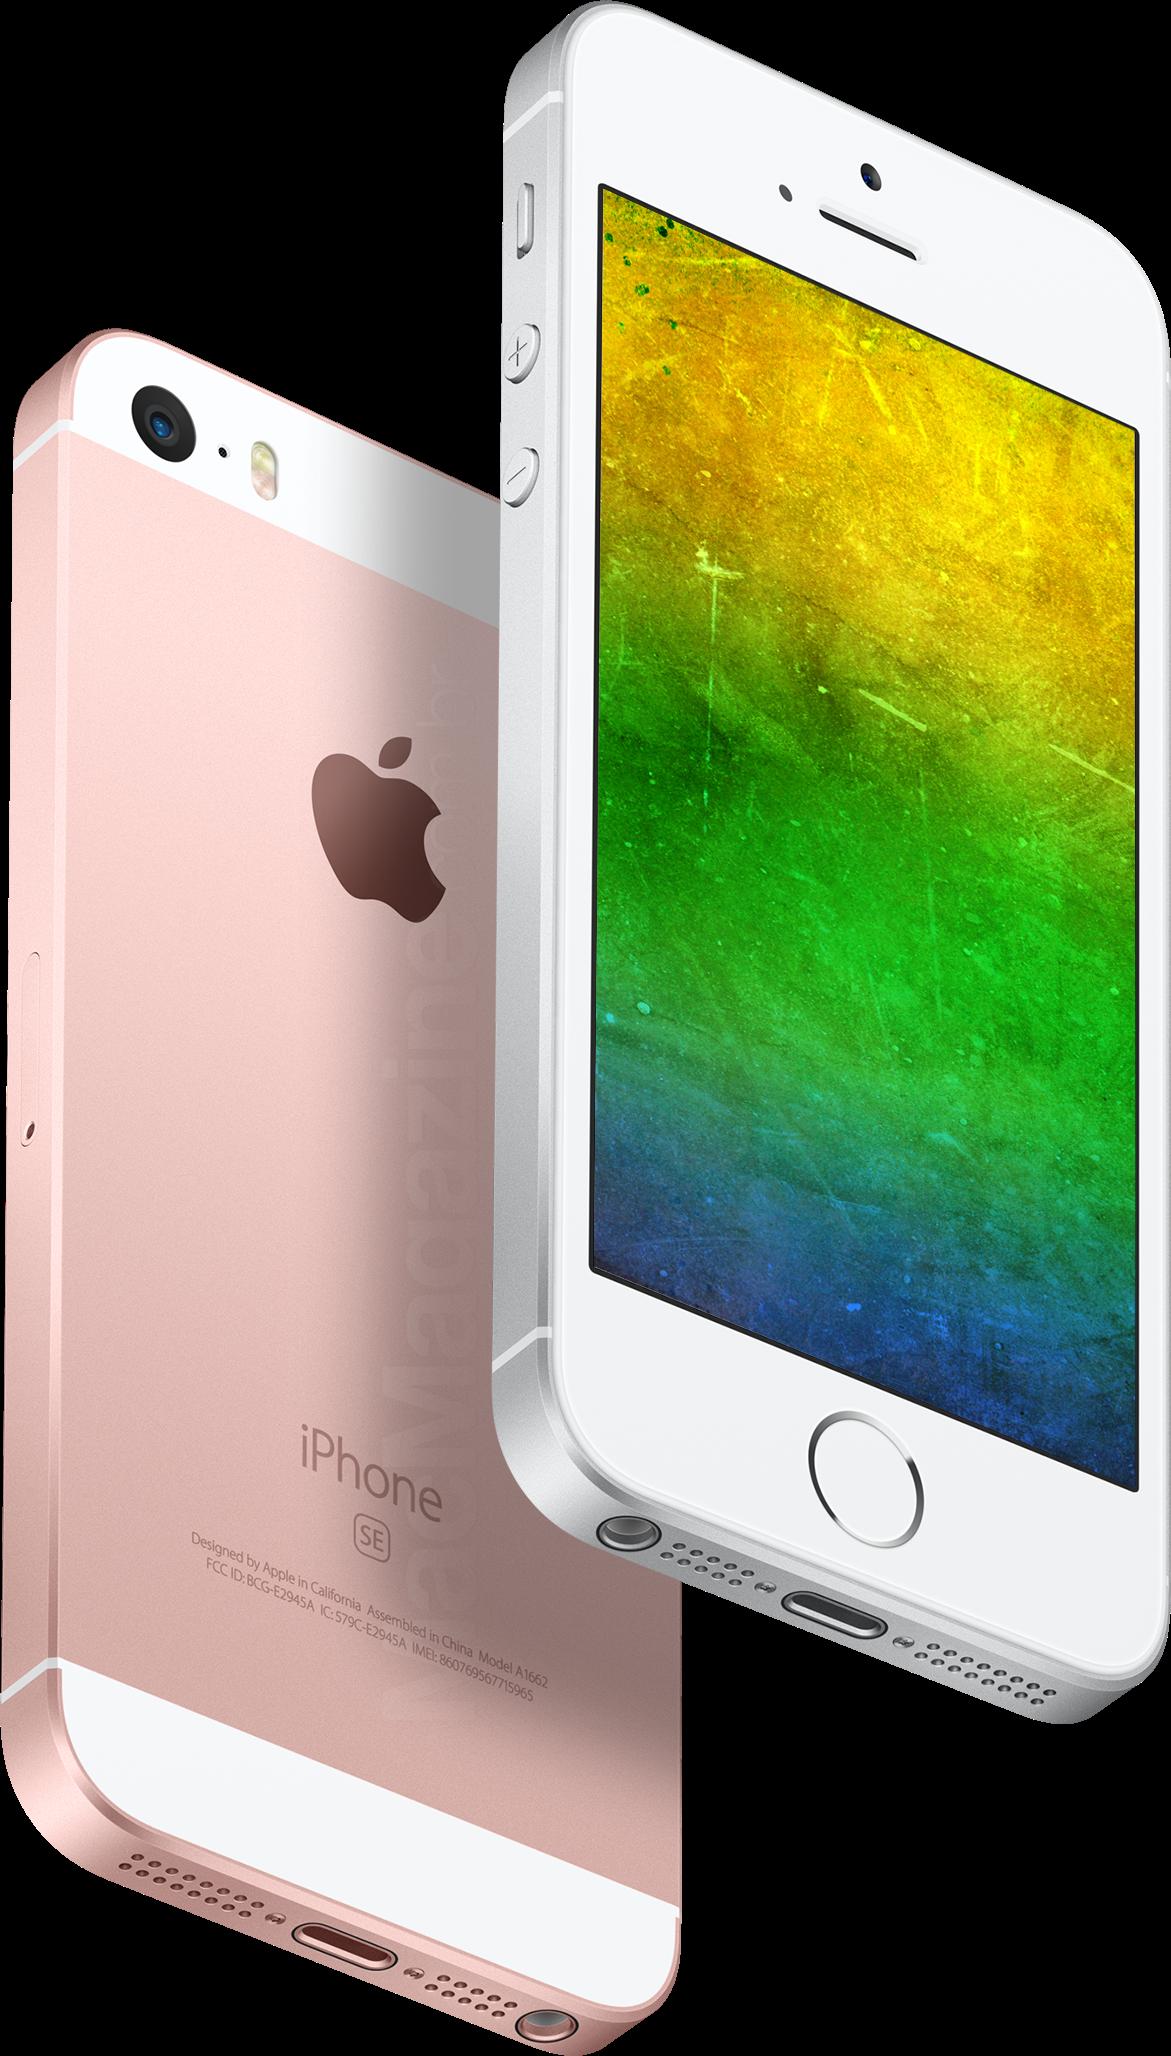 iPhones SE com as cores do Brasil (by MacMagazine)